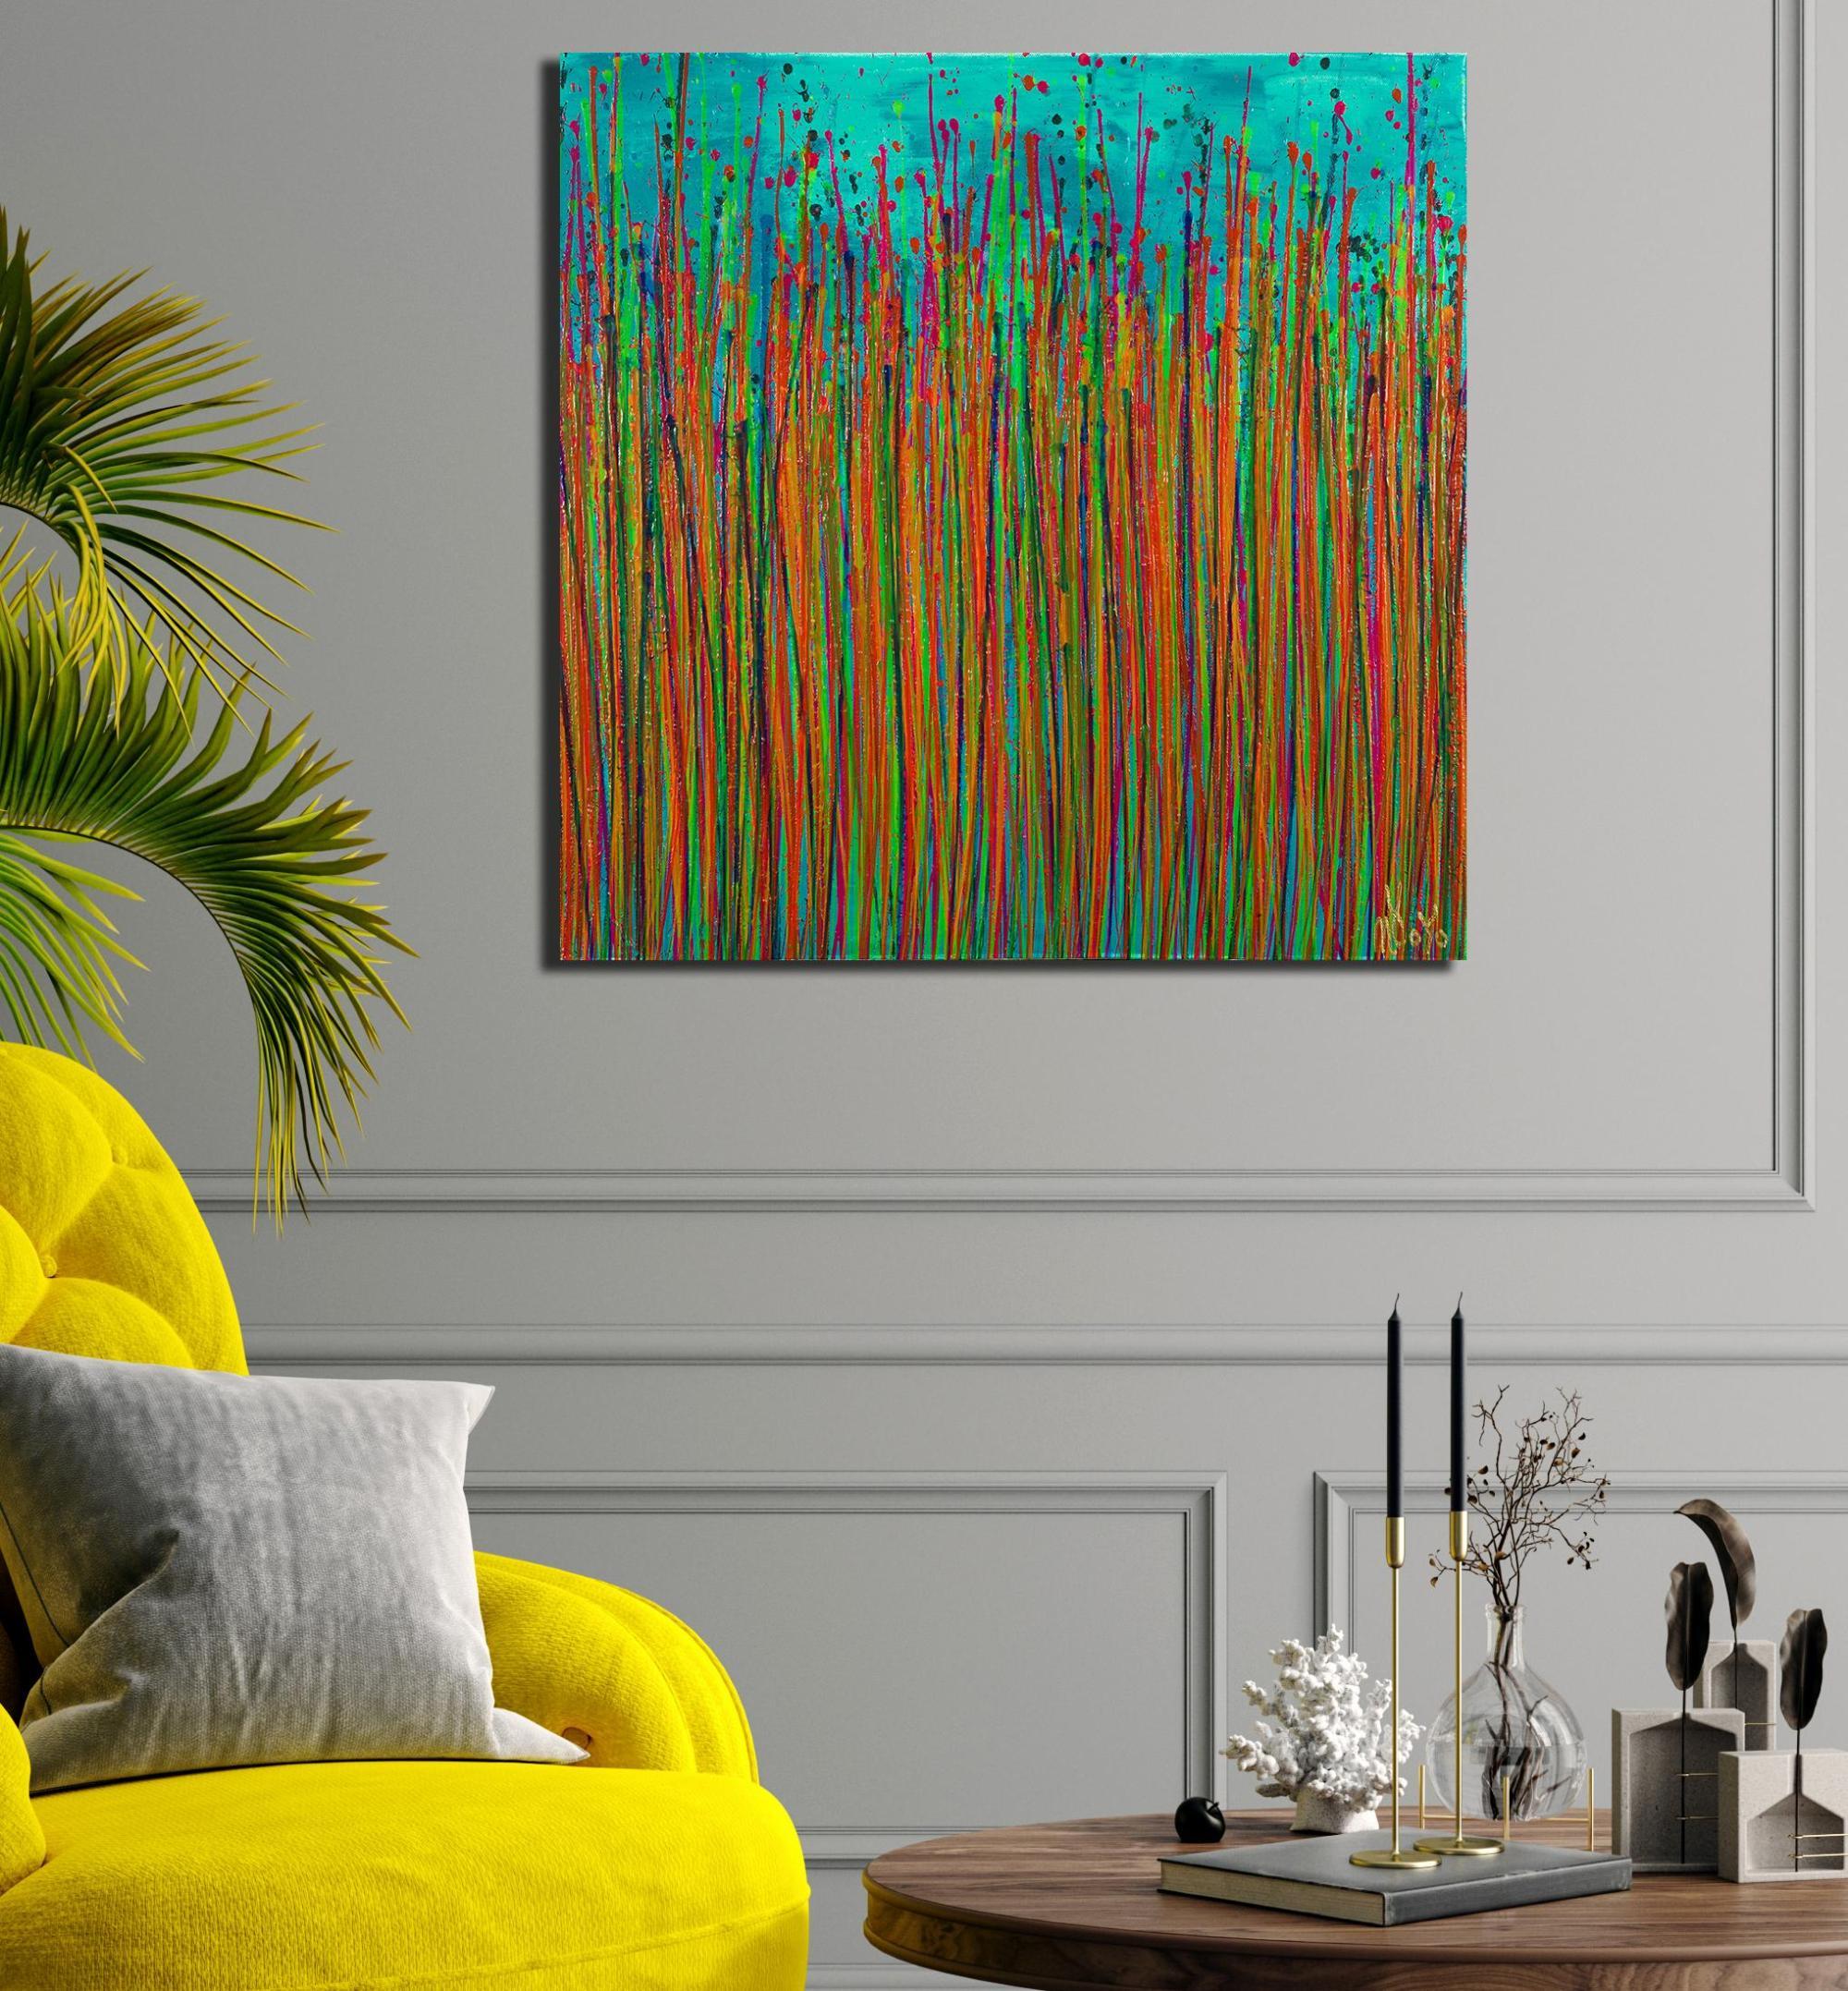 Caribbean Reflections 5 (2021) / Artist: Nestor Toro